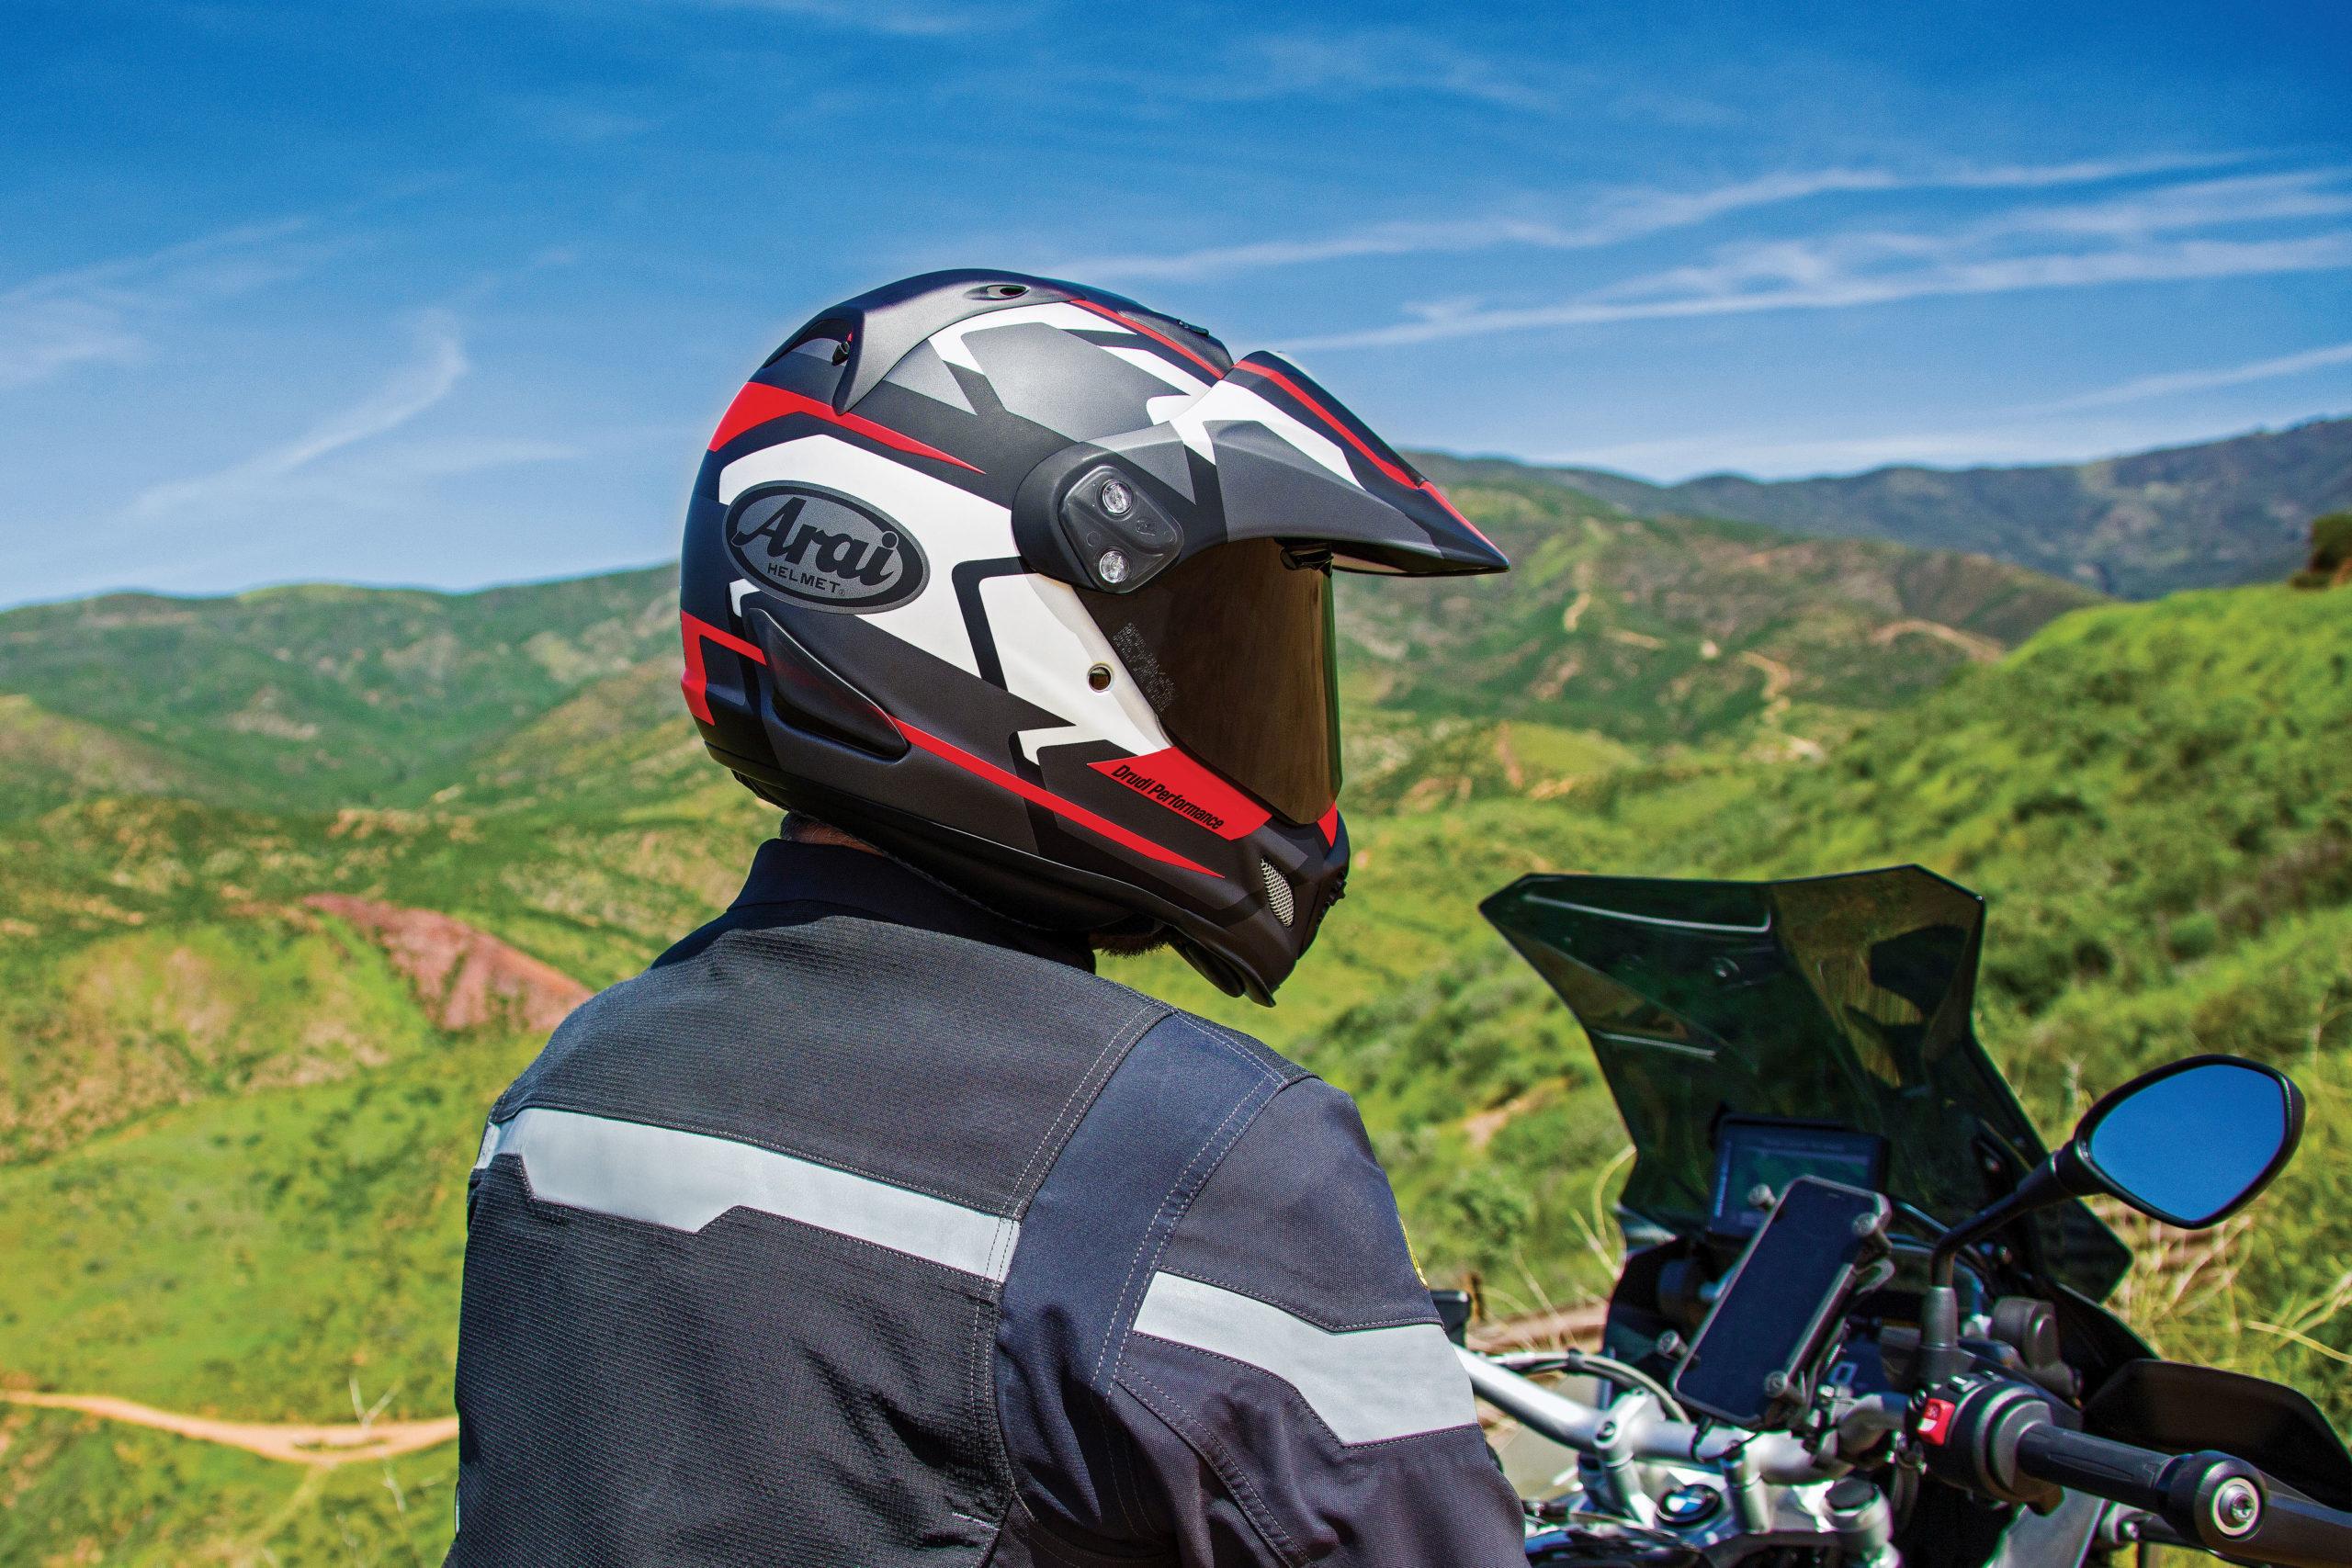 Rider wearing Arai XD4 helmet